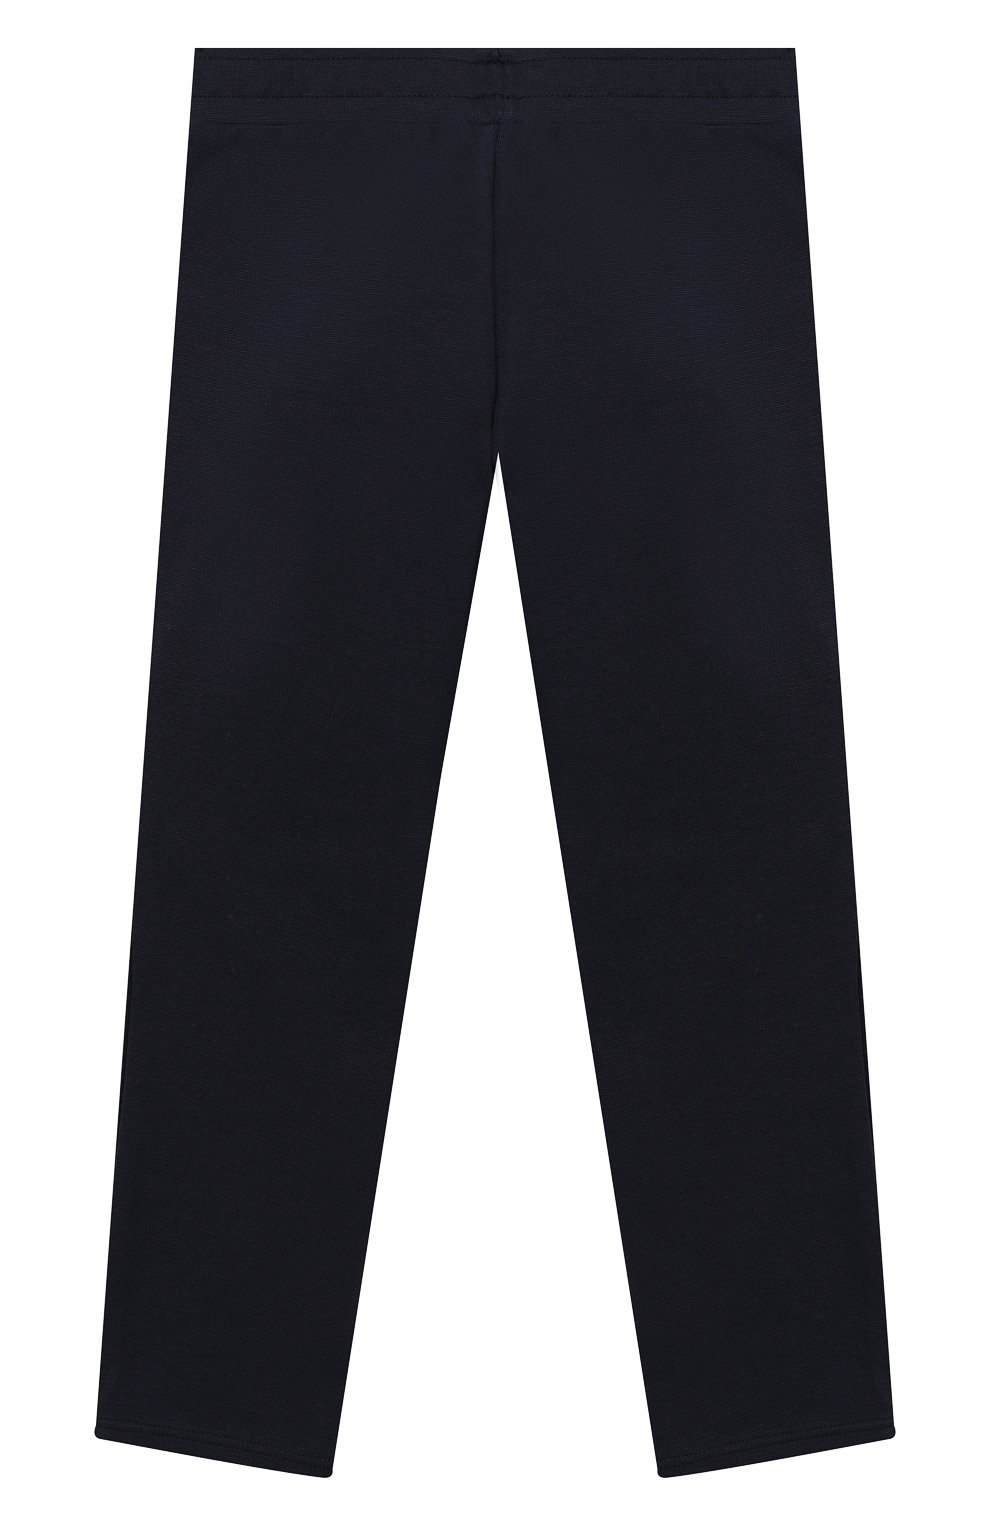 Детский комплект из кардигана и брюк MARC JACOBS (THE) синего цвета, арт. W08066   Фото 6